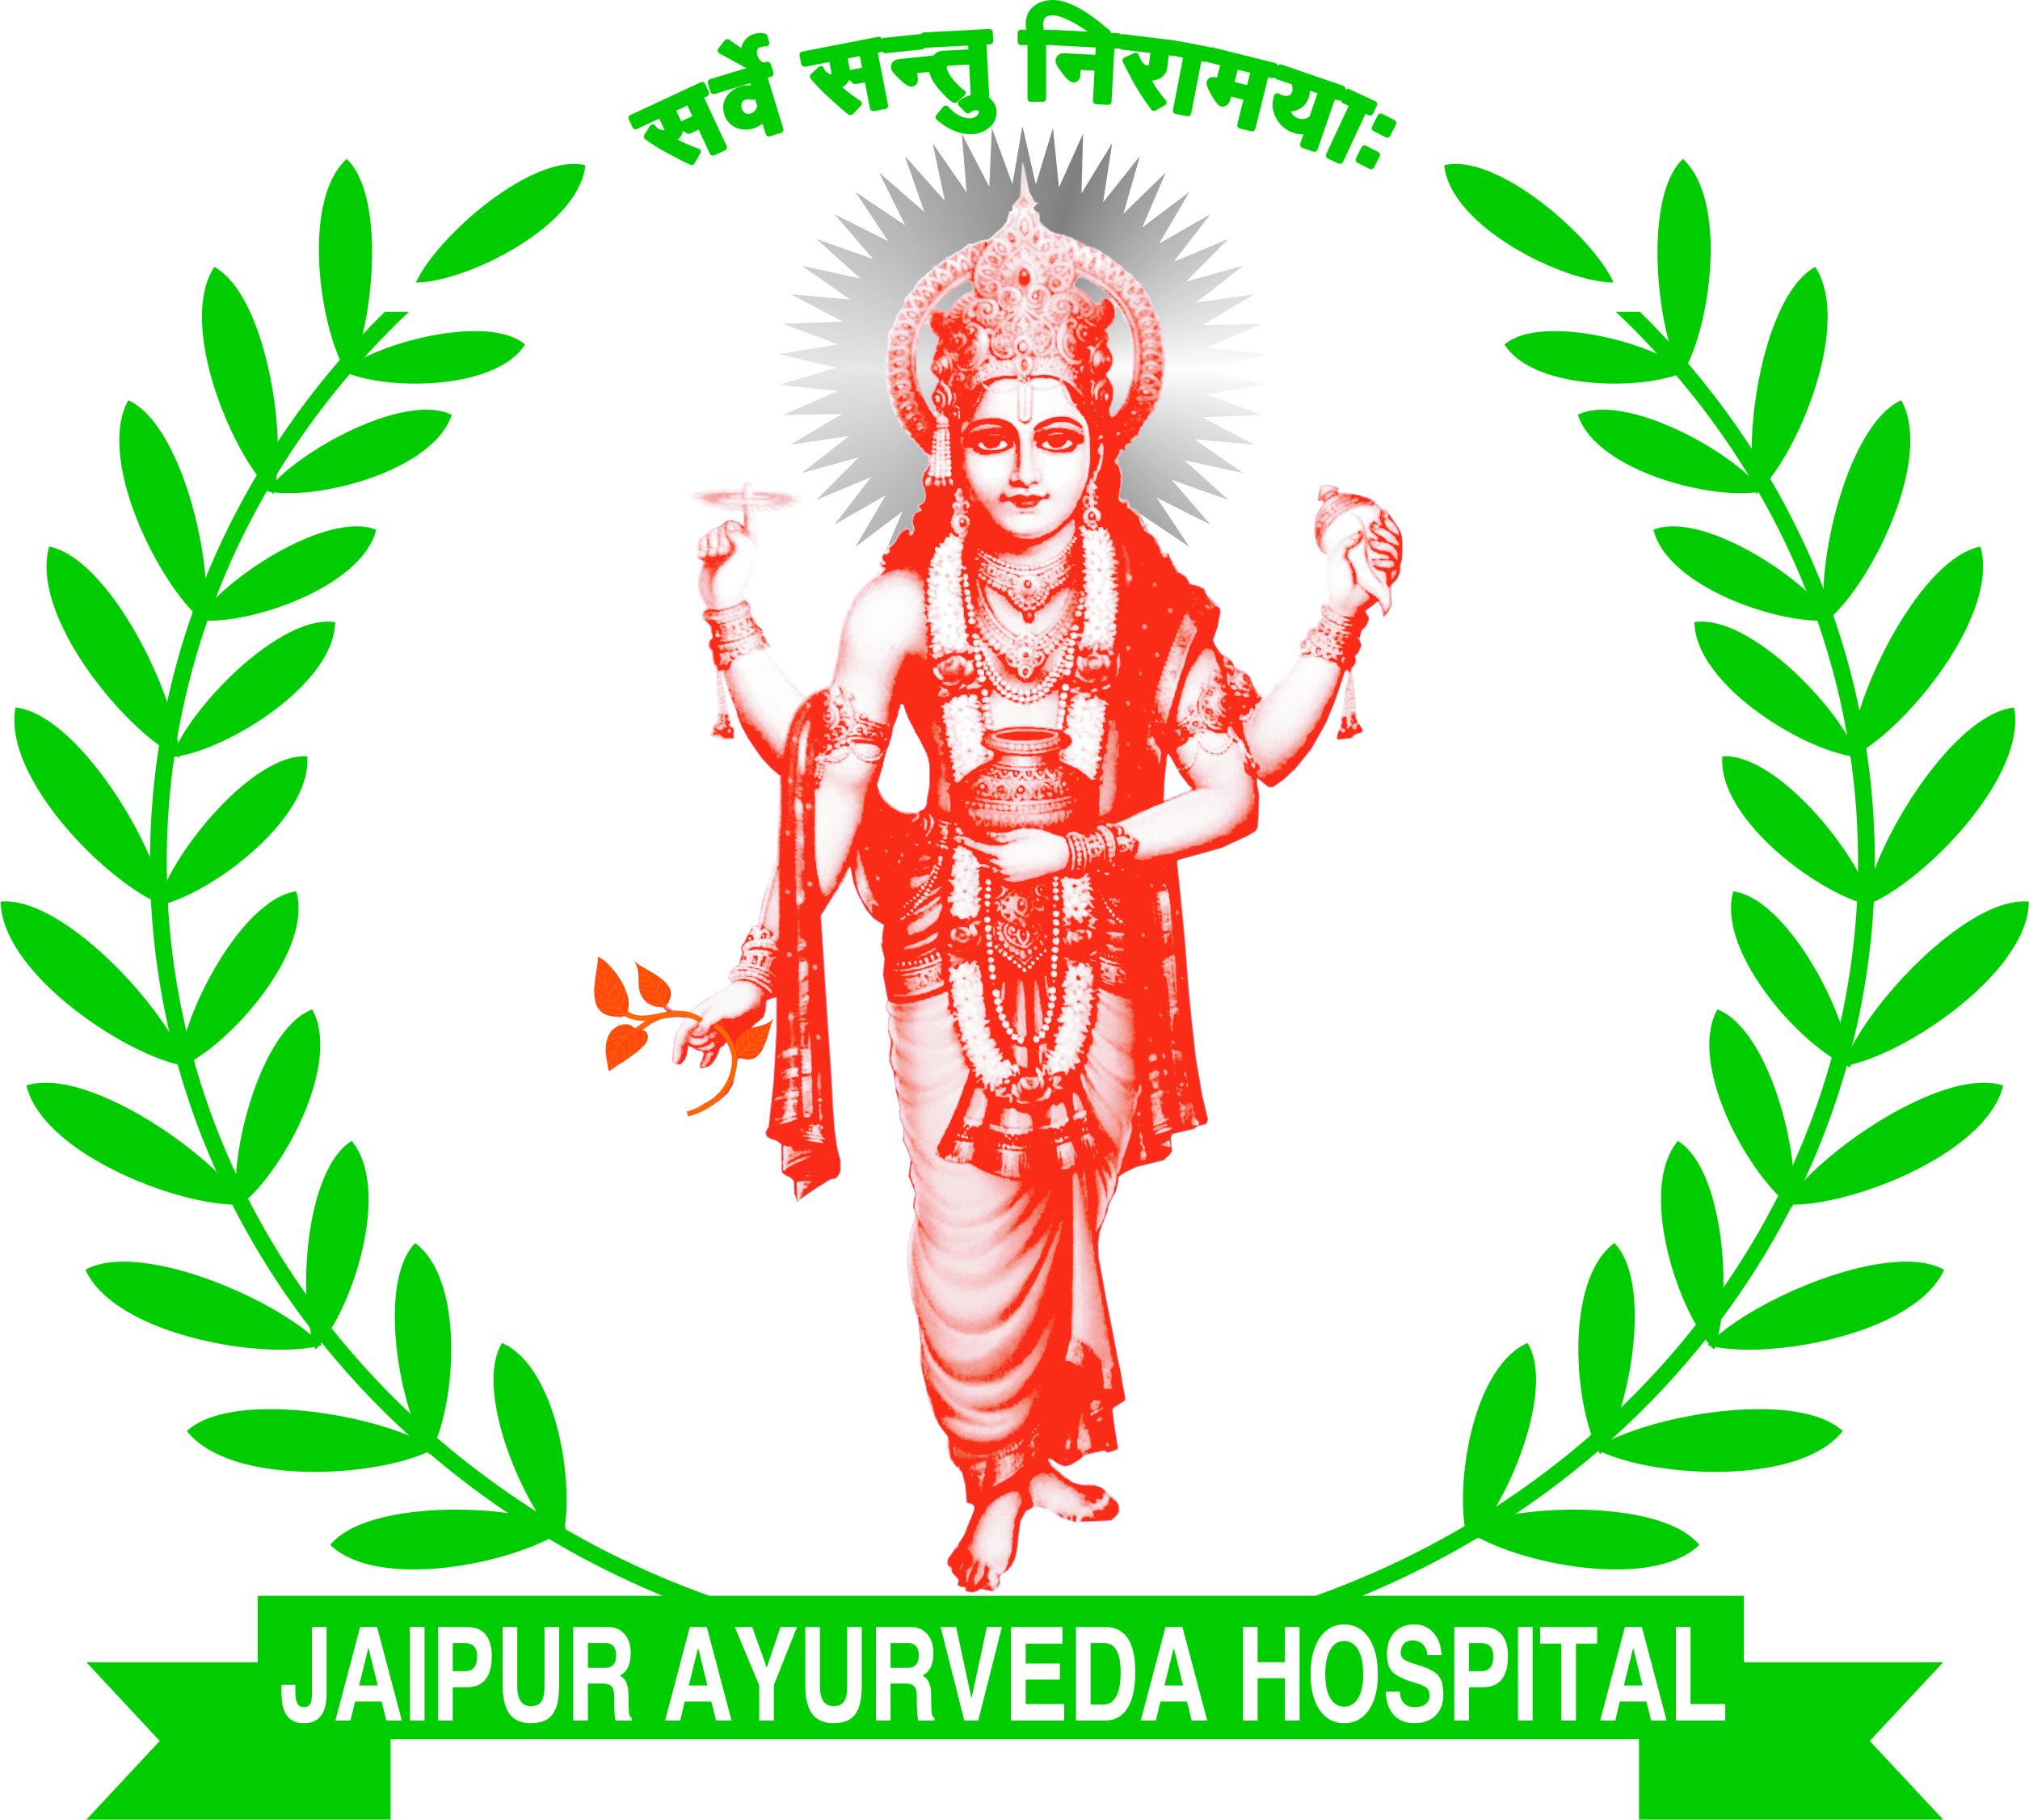 Jaipur Ayurveda Hospital | Ayurveda Hospital in India